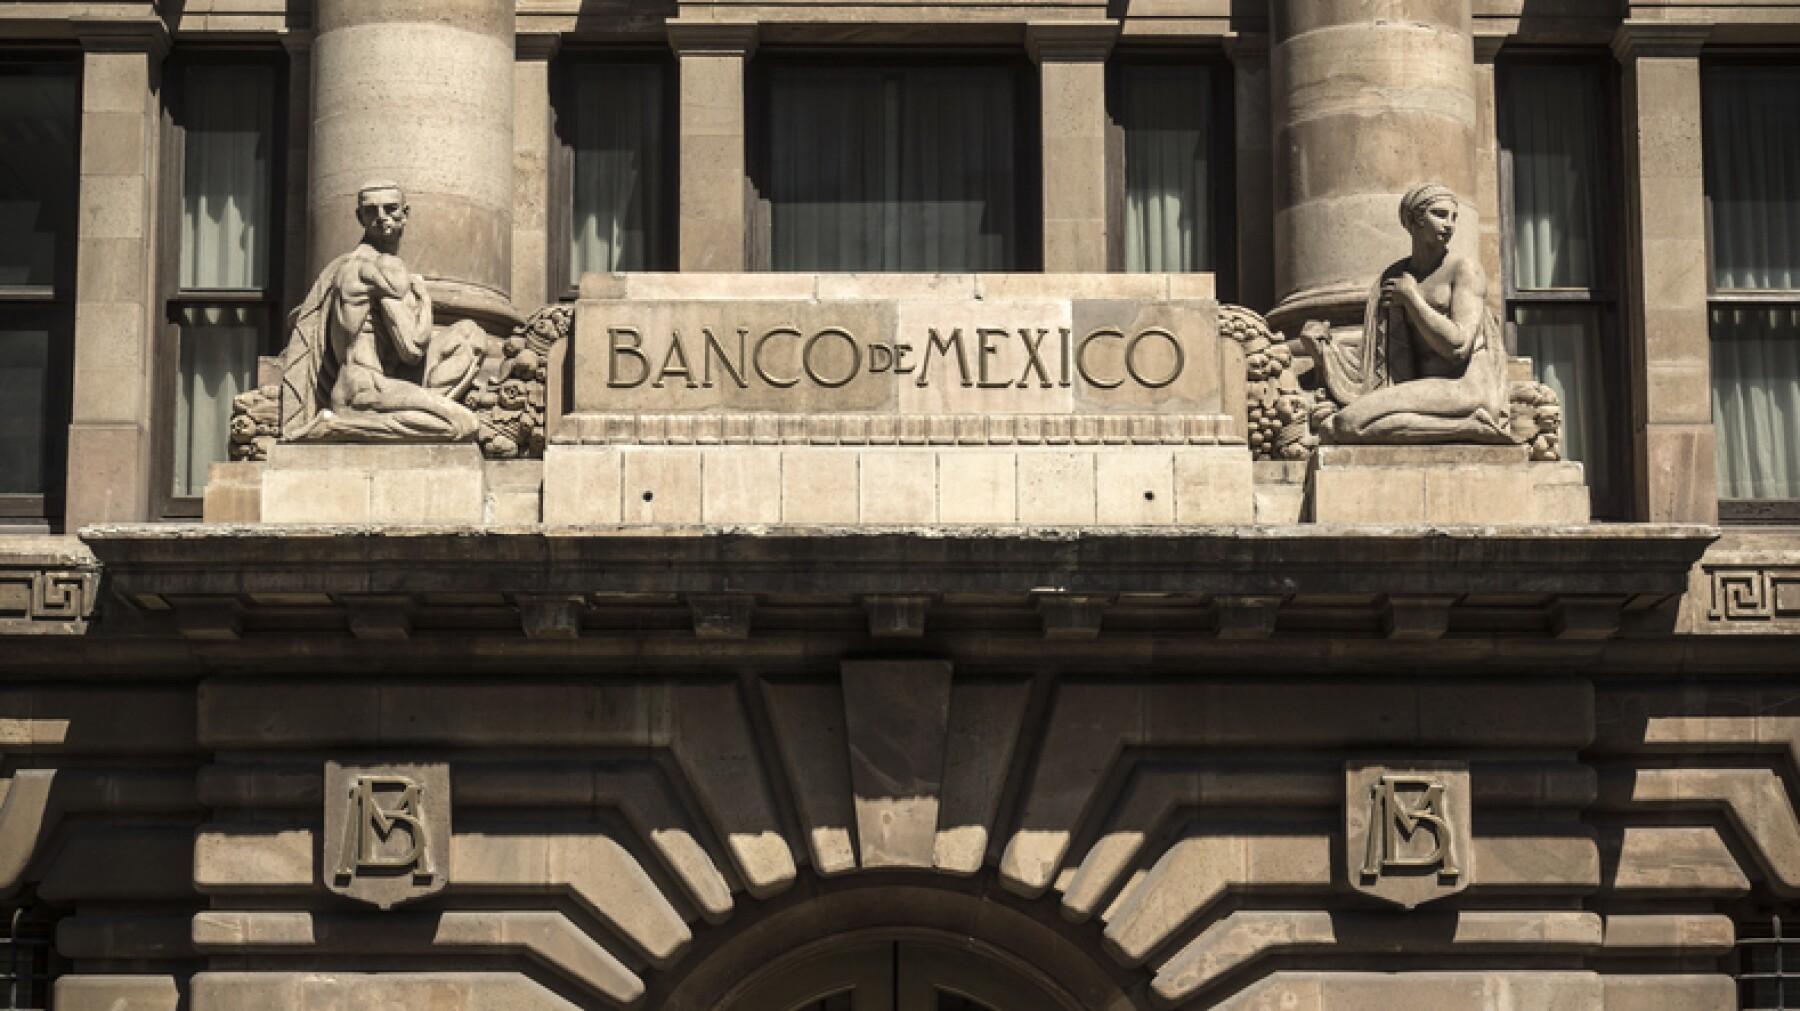 Banco de M´éxico